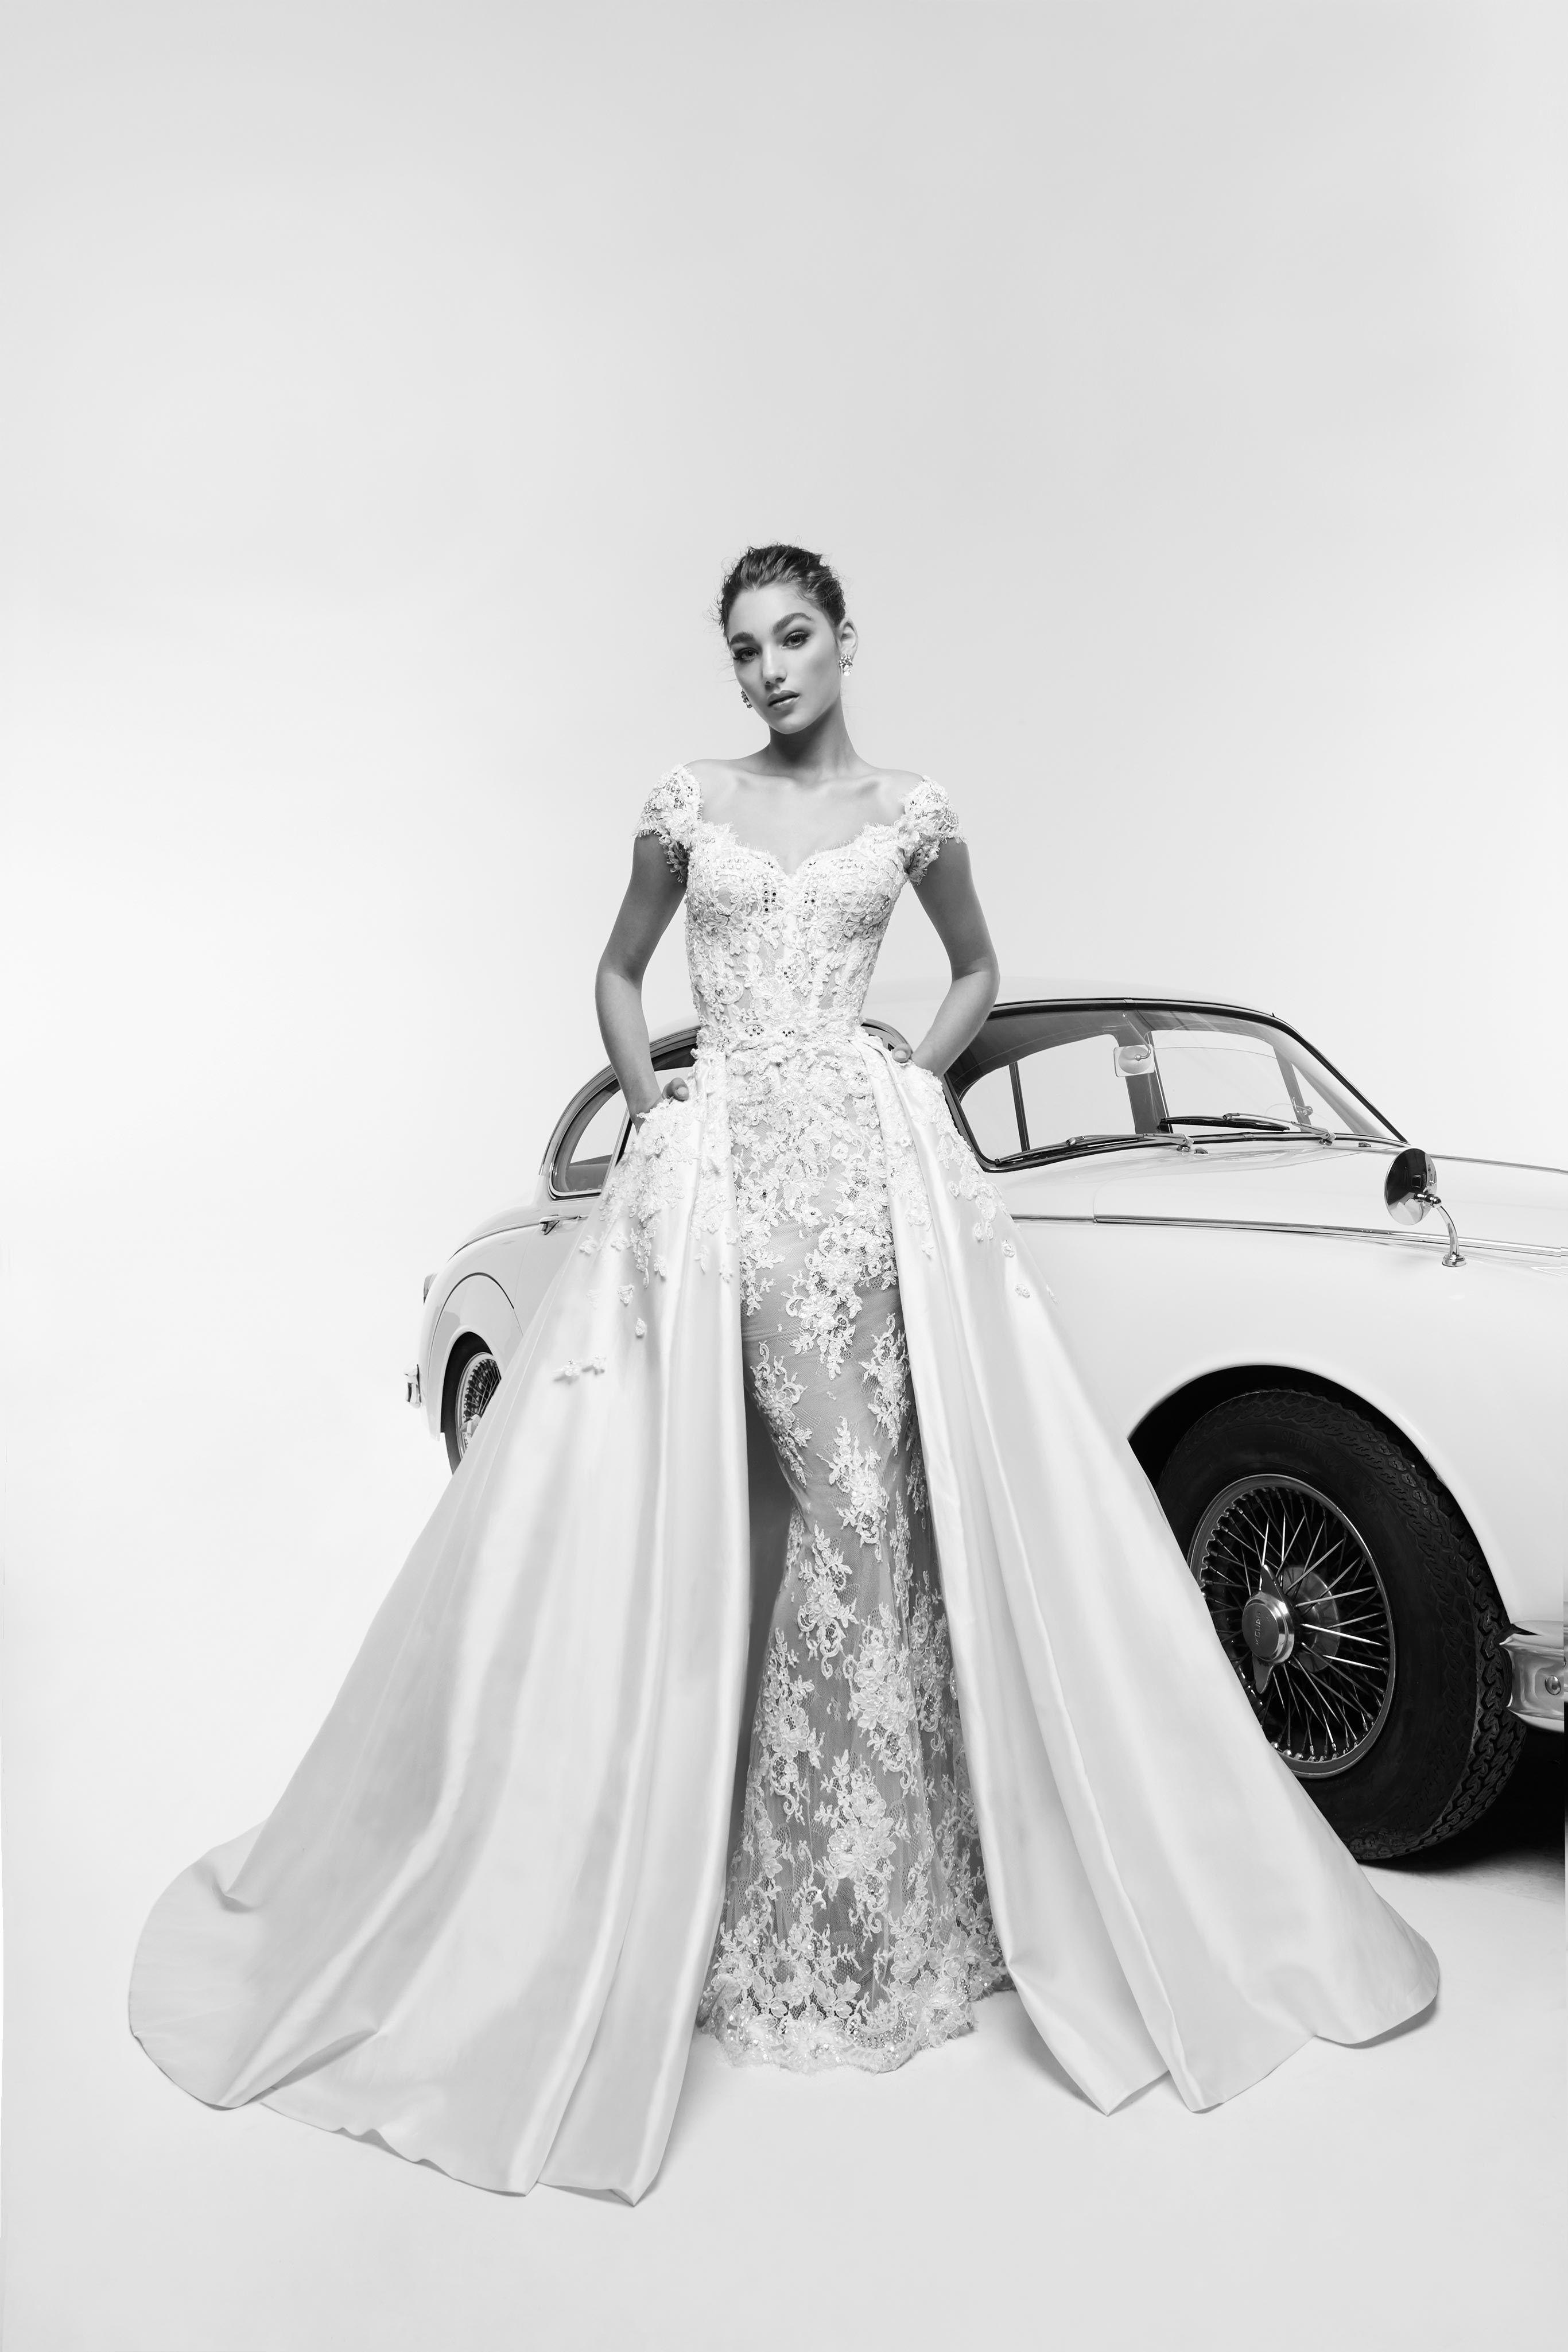 Zuhair Murad Bridal Spring 2019 Collection Zuhair Murad Bridal Wedding Dresses Zuhair Murad Stunning Wedding Dresses